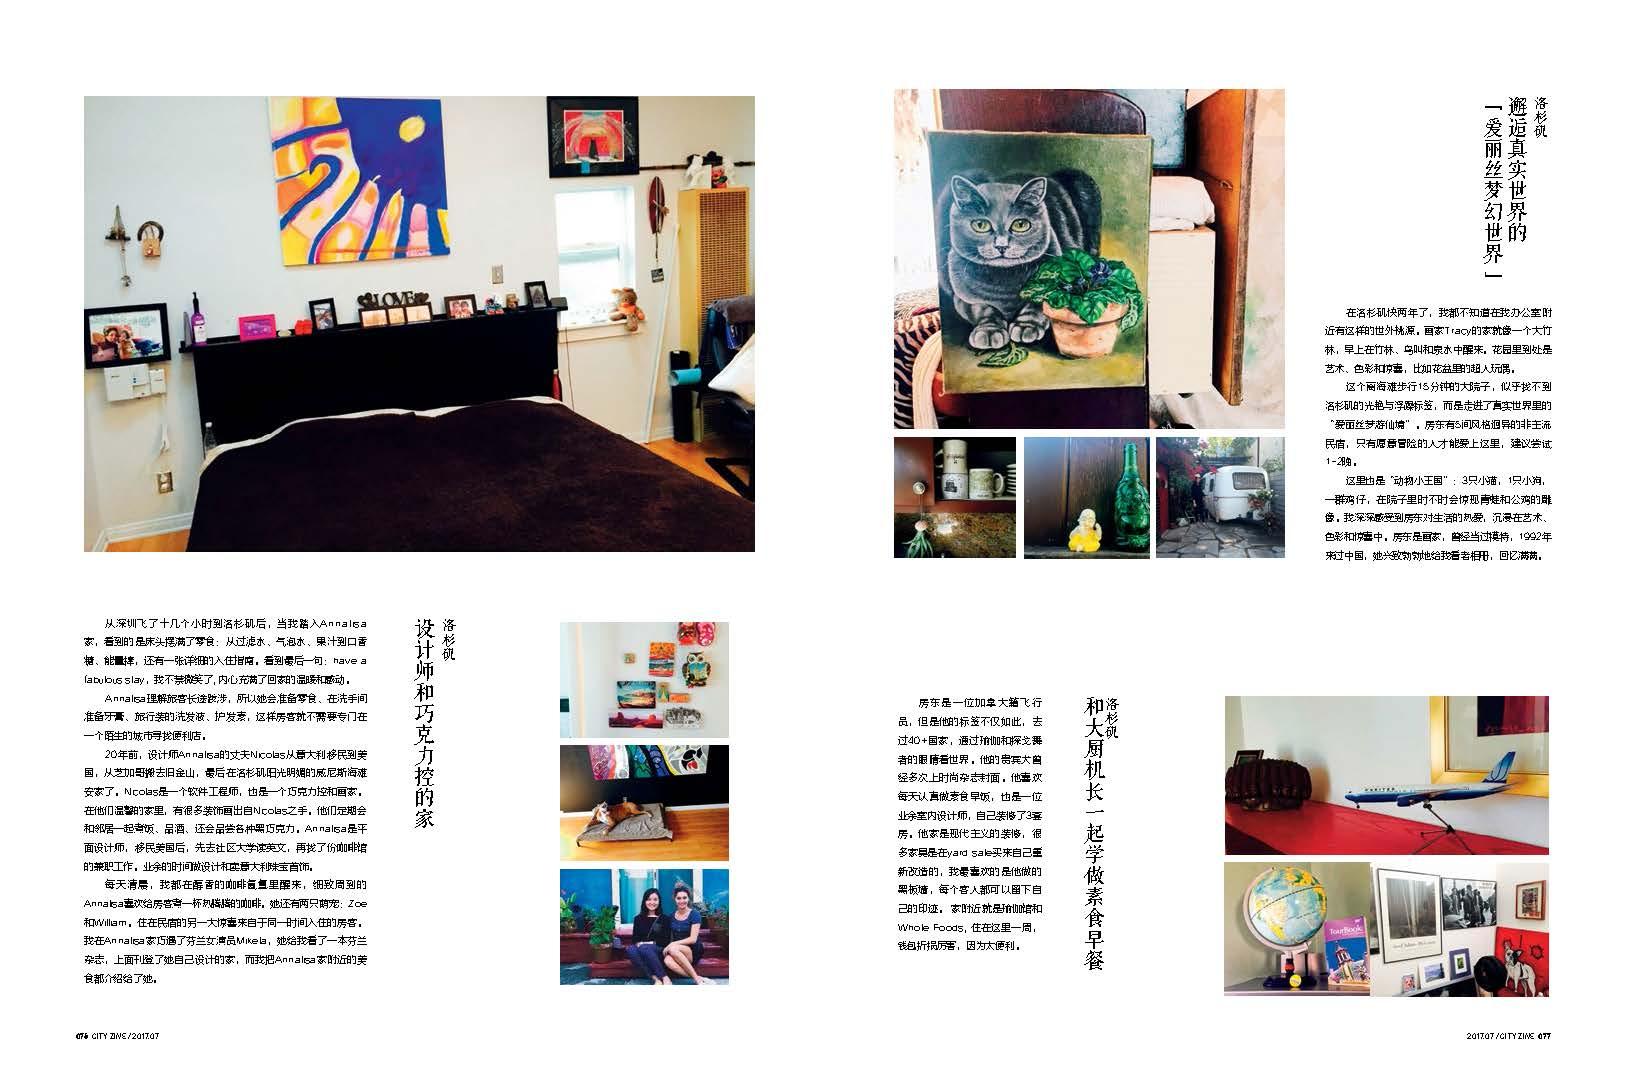 P64-83苹果02 CITYZINE final_Page_07.jpg